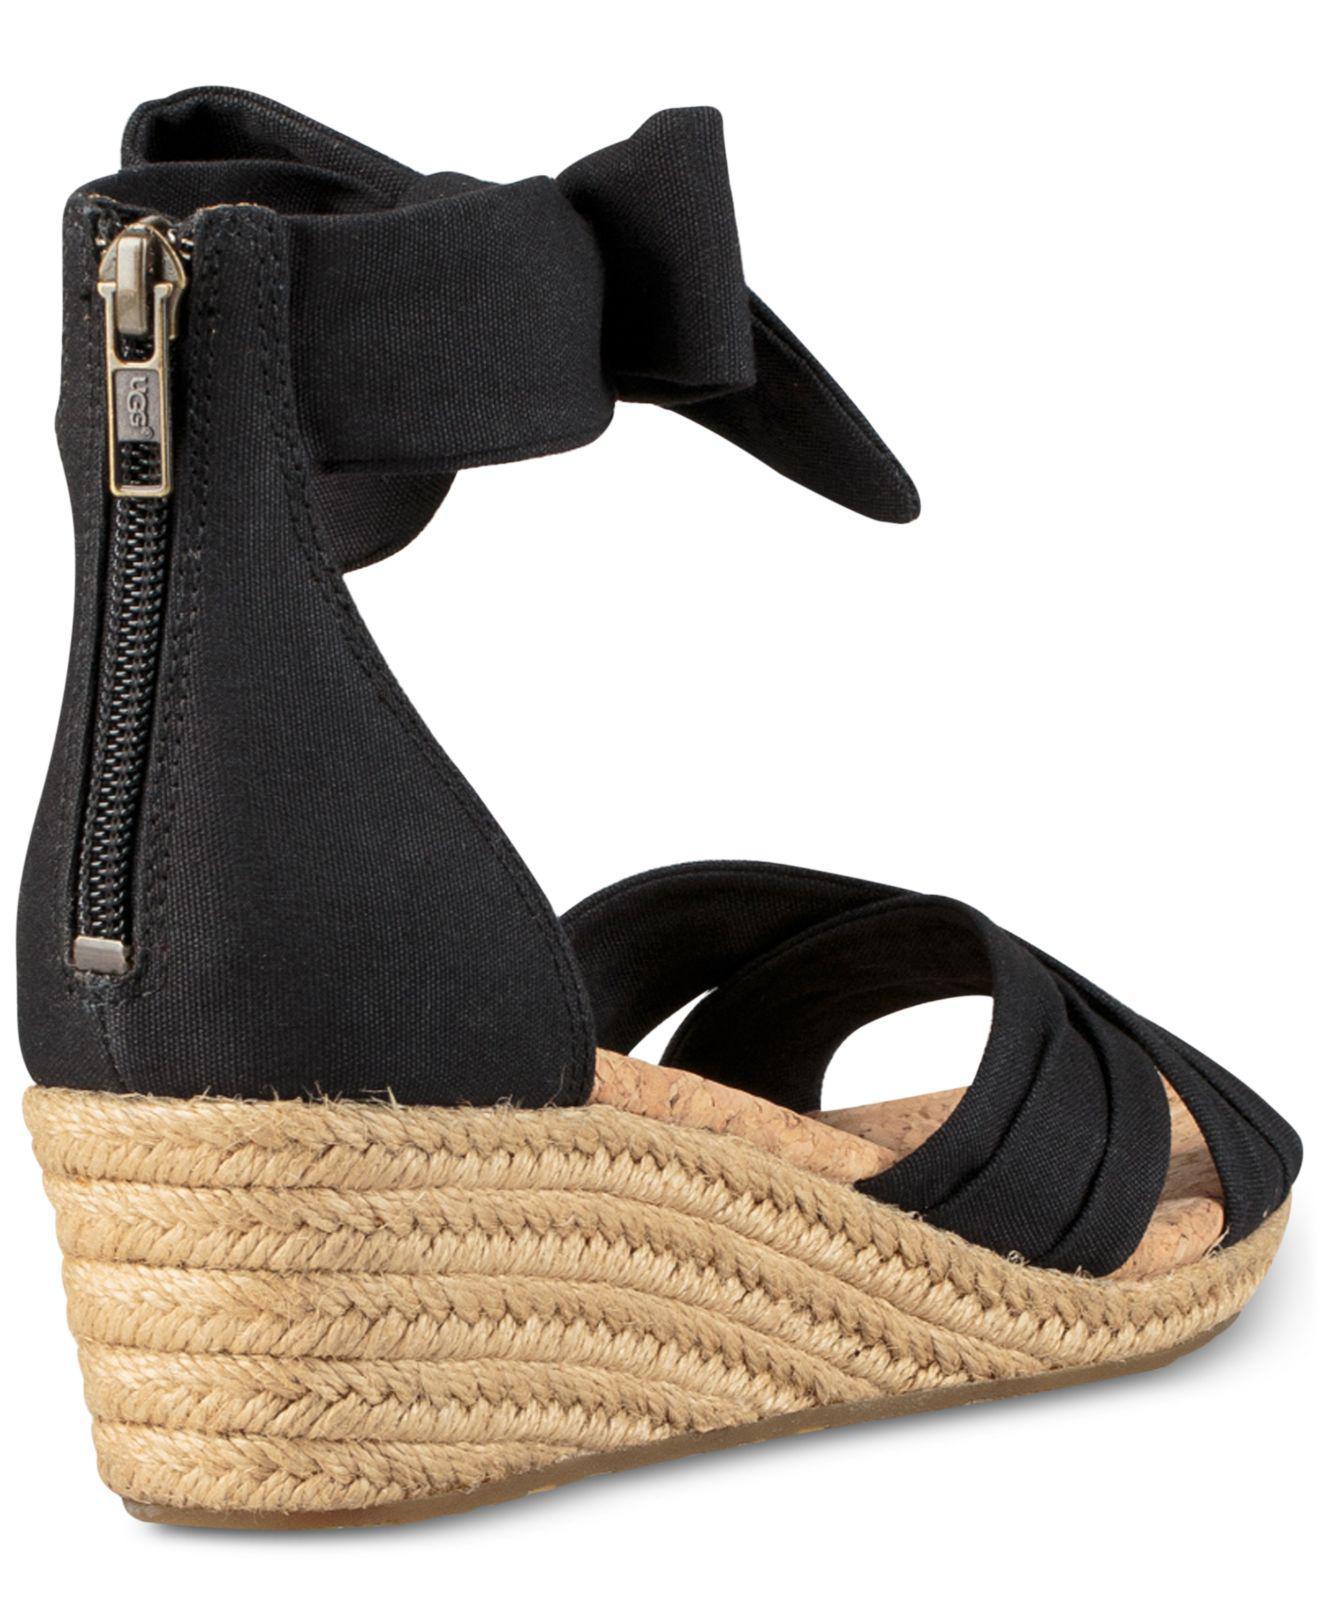 c467f7b49b1 Lyst - UGG Traci Espadrille Wedge Sandals in Black